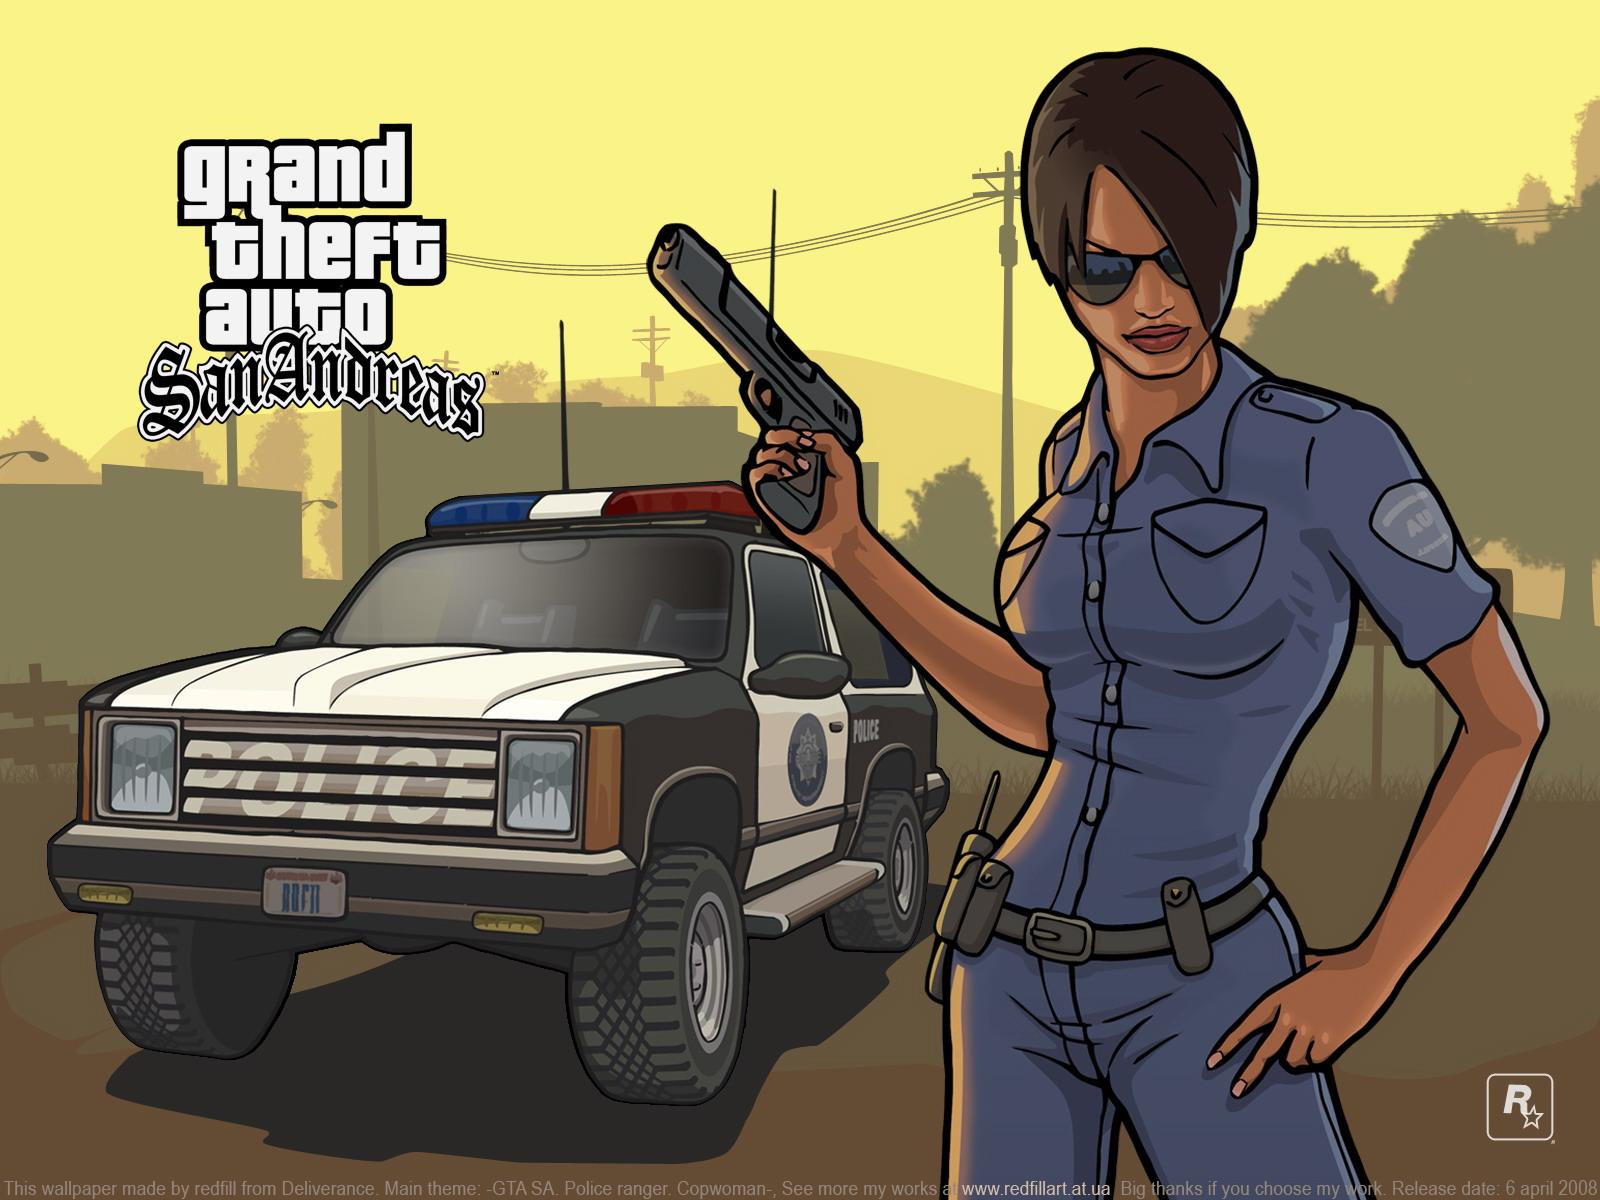 876125gta-san-andreas-police-ranger-copw